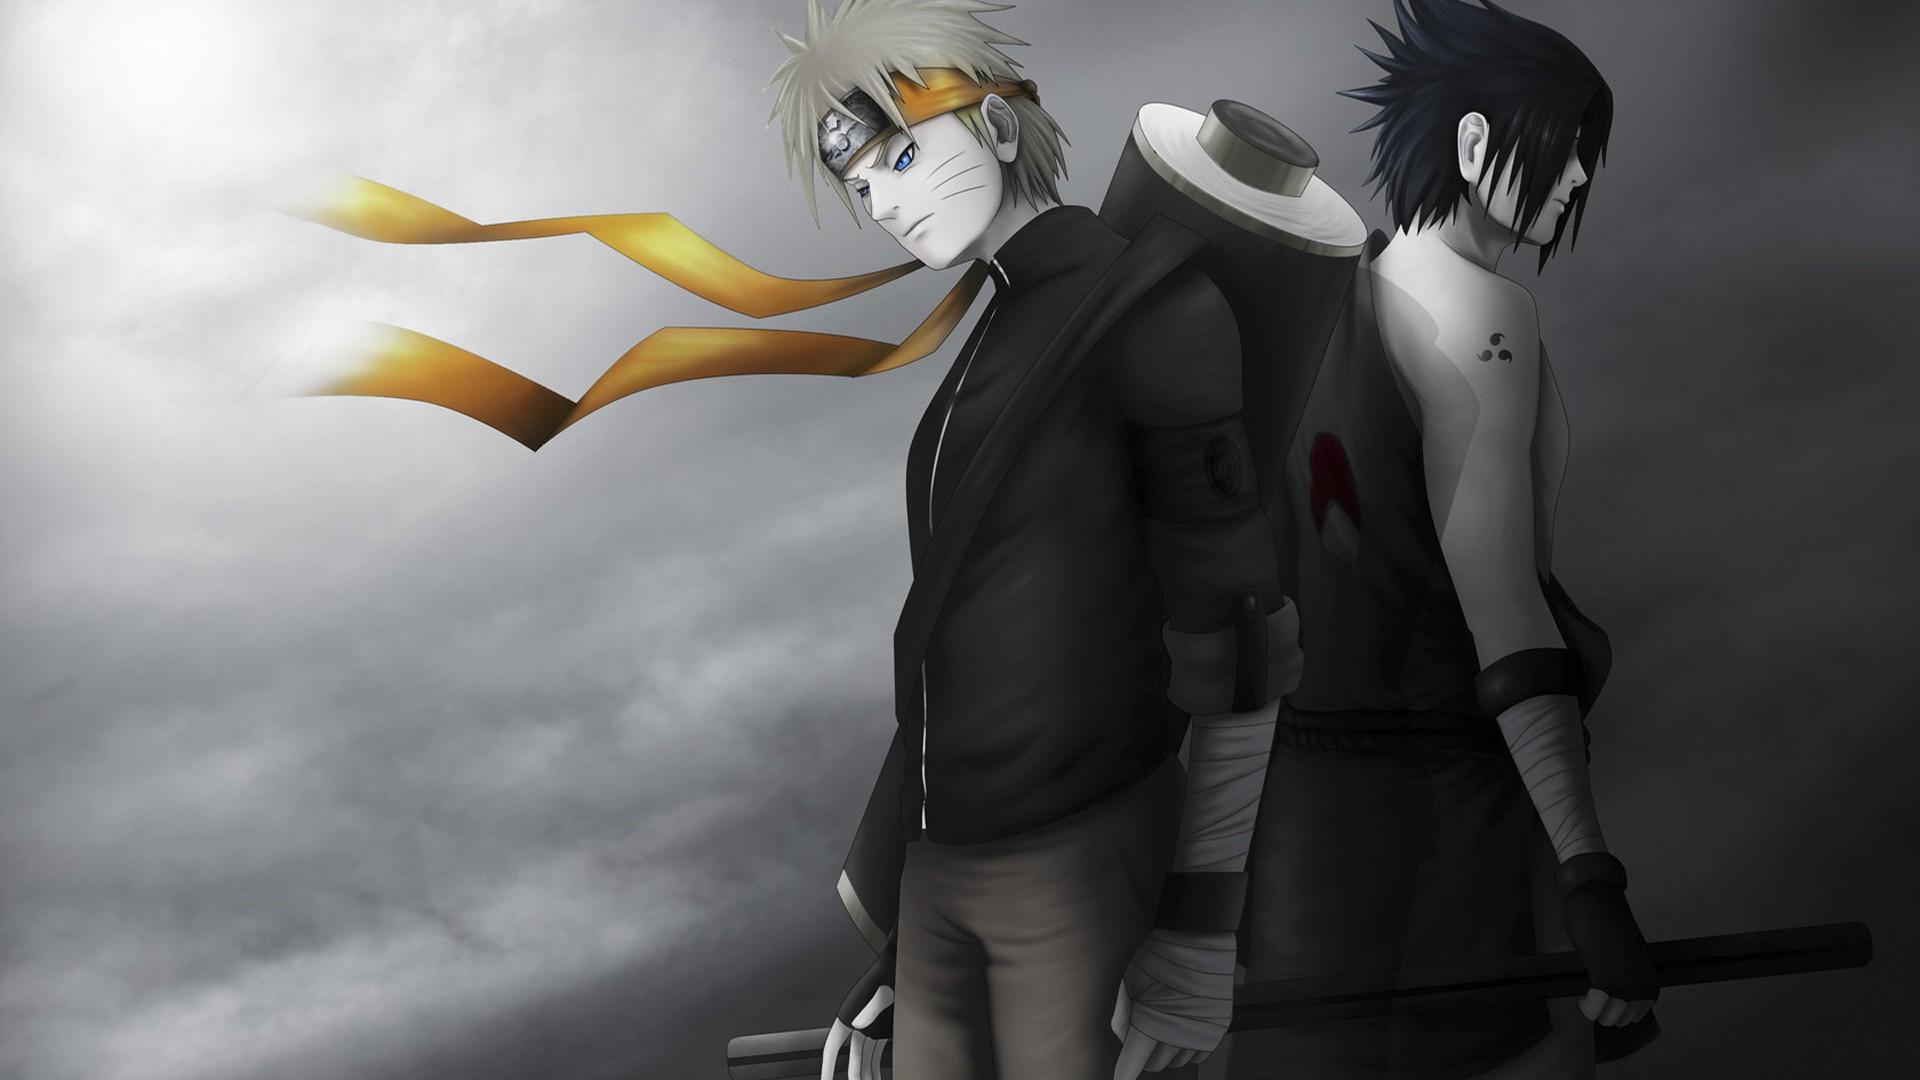 Wallpaper Hd 1080p 3d Anime gambar ke 11